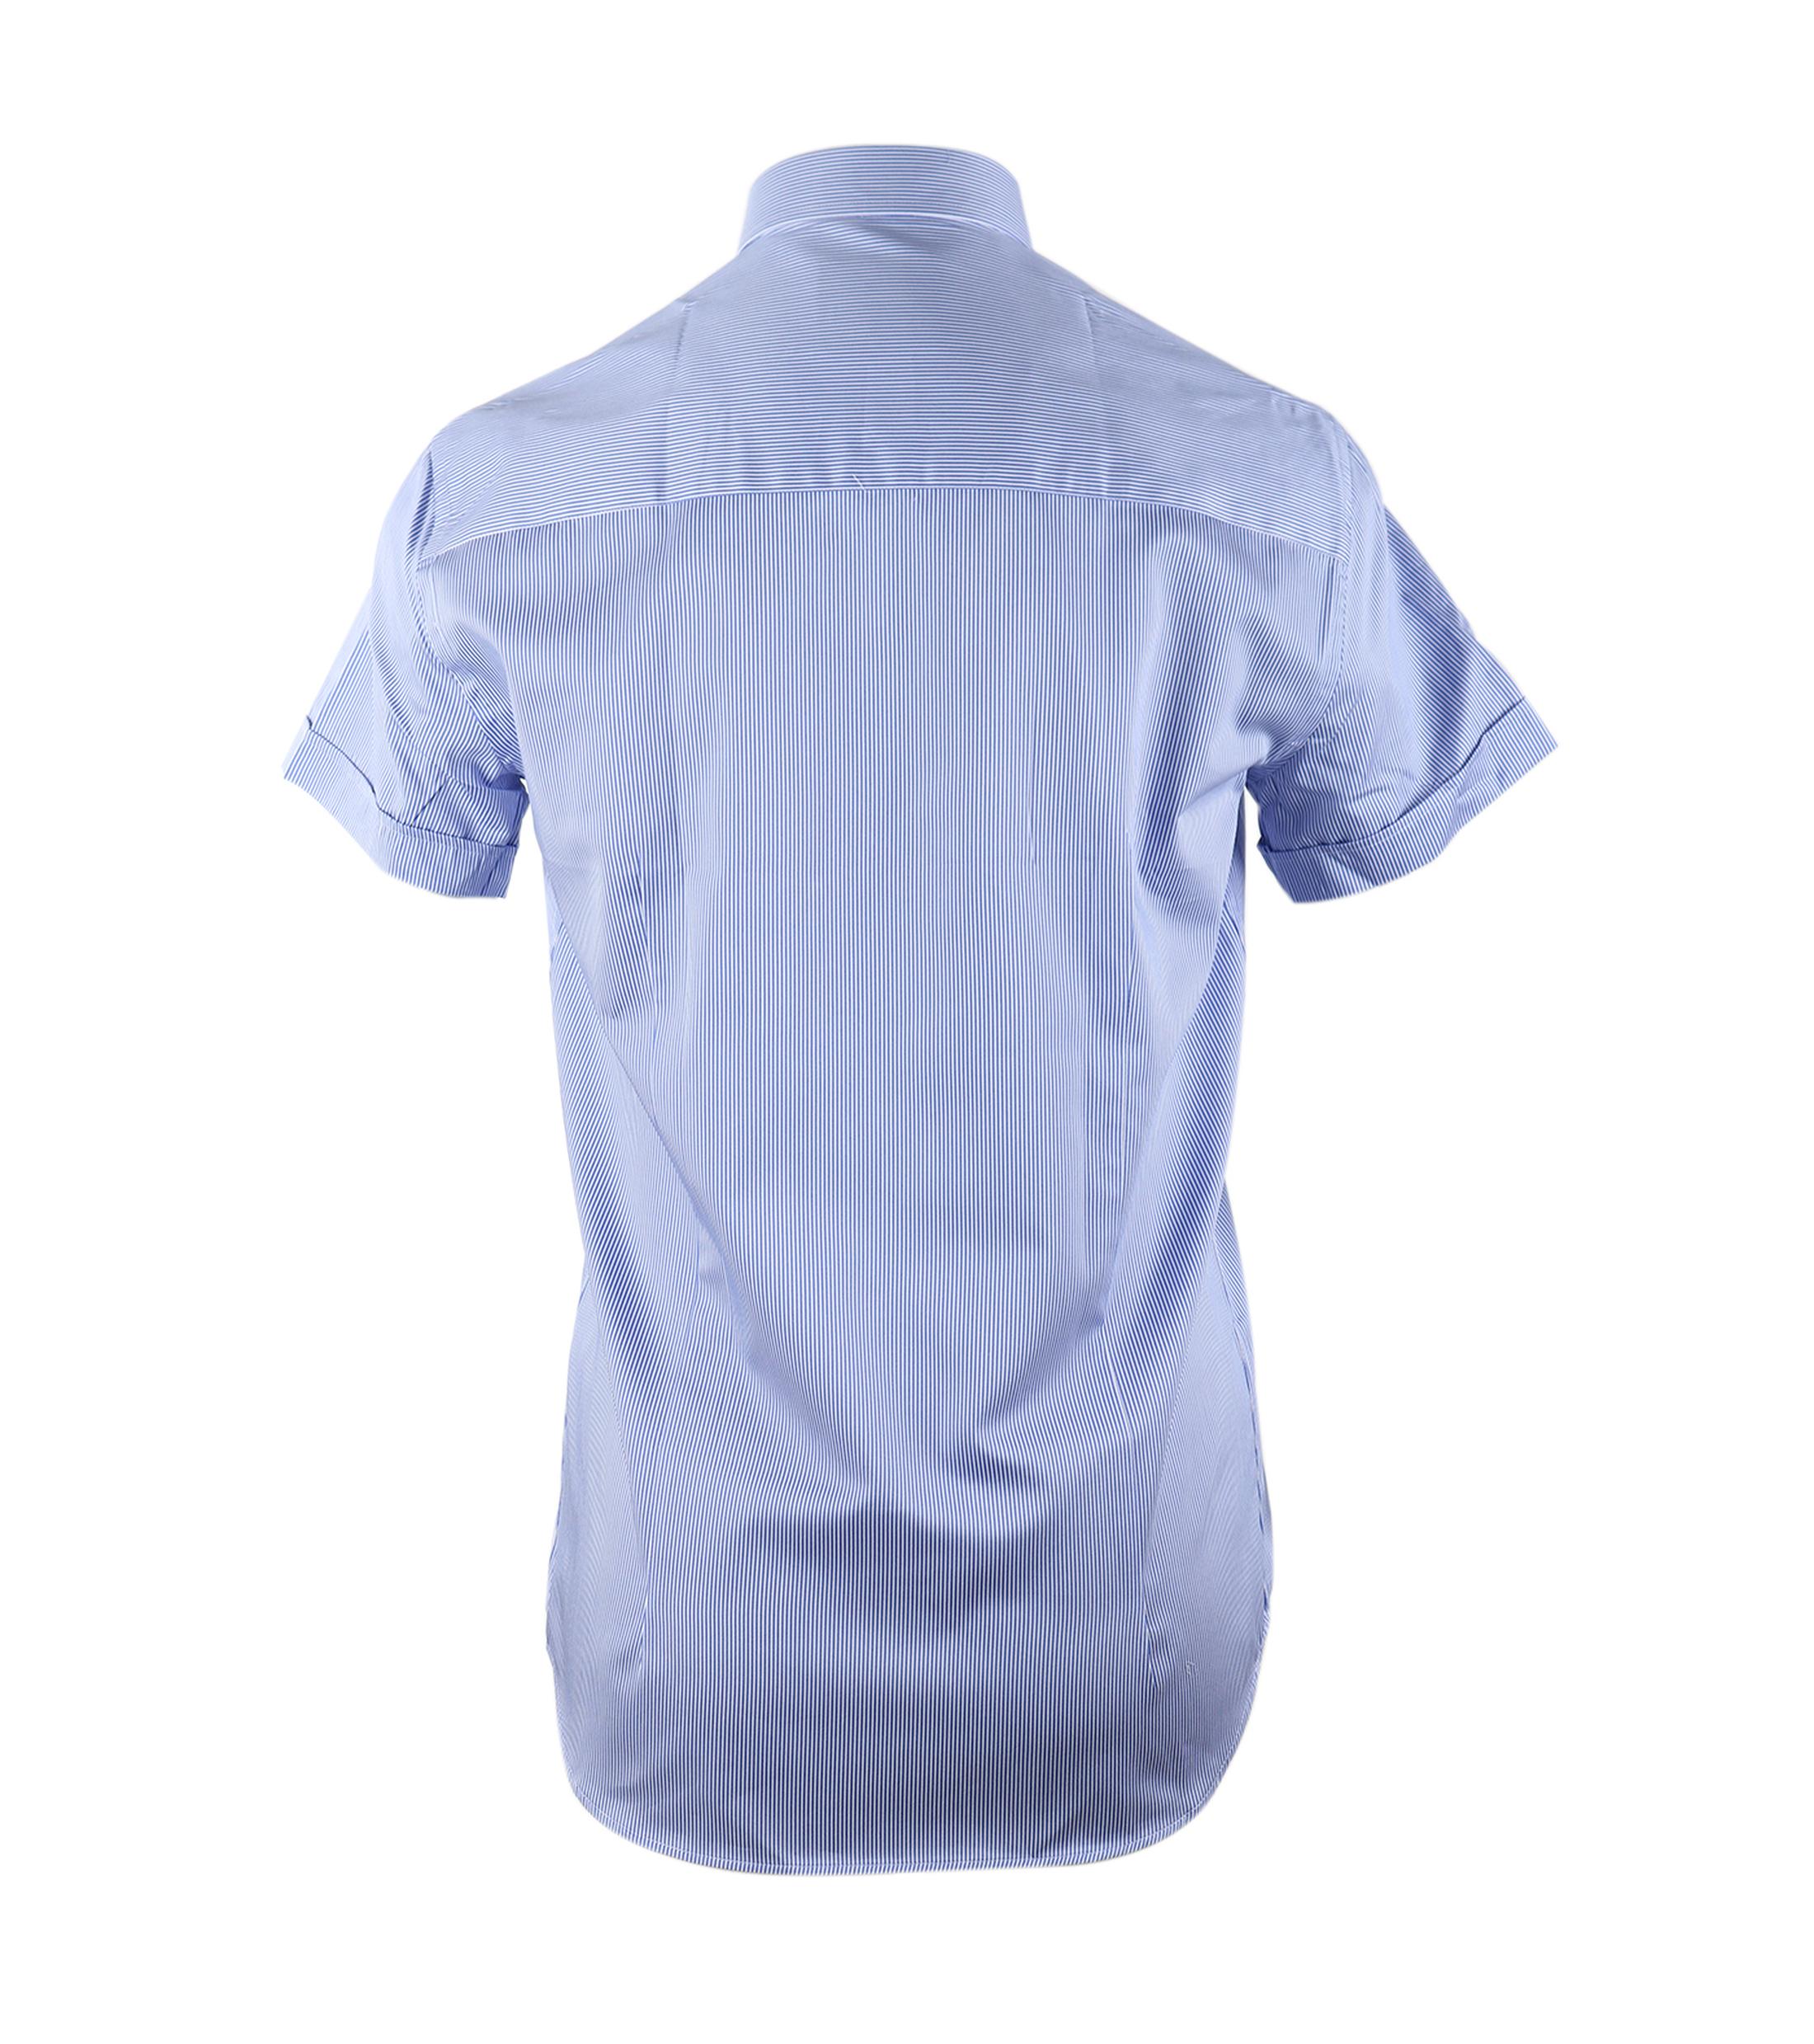 Casual Overhemd S3-6 Blauw Wit foto 3